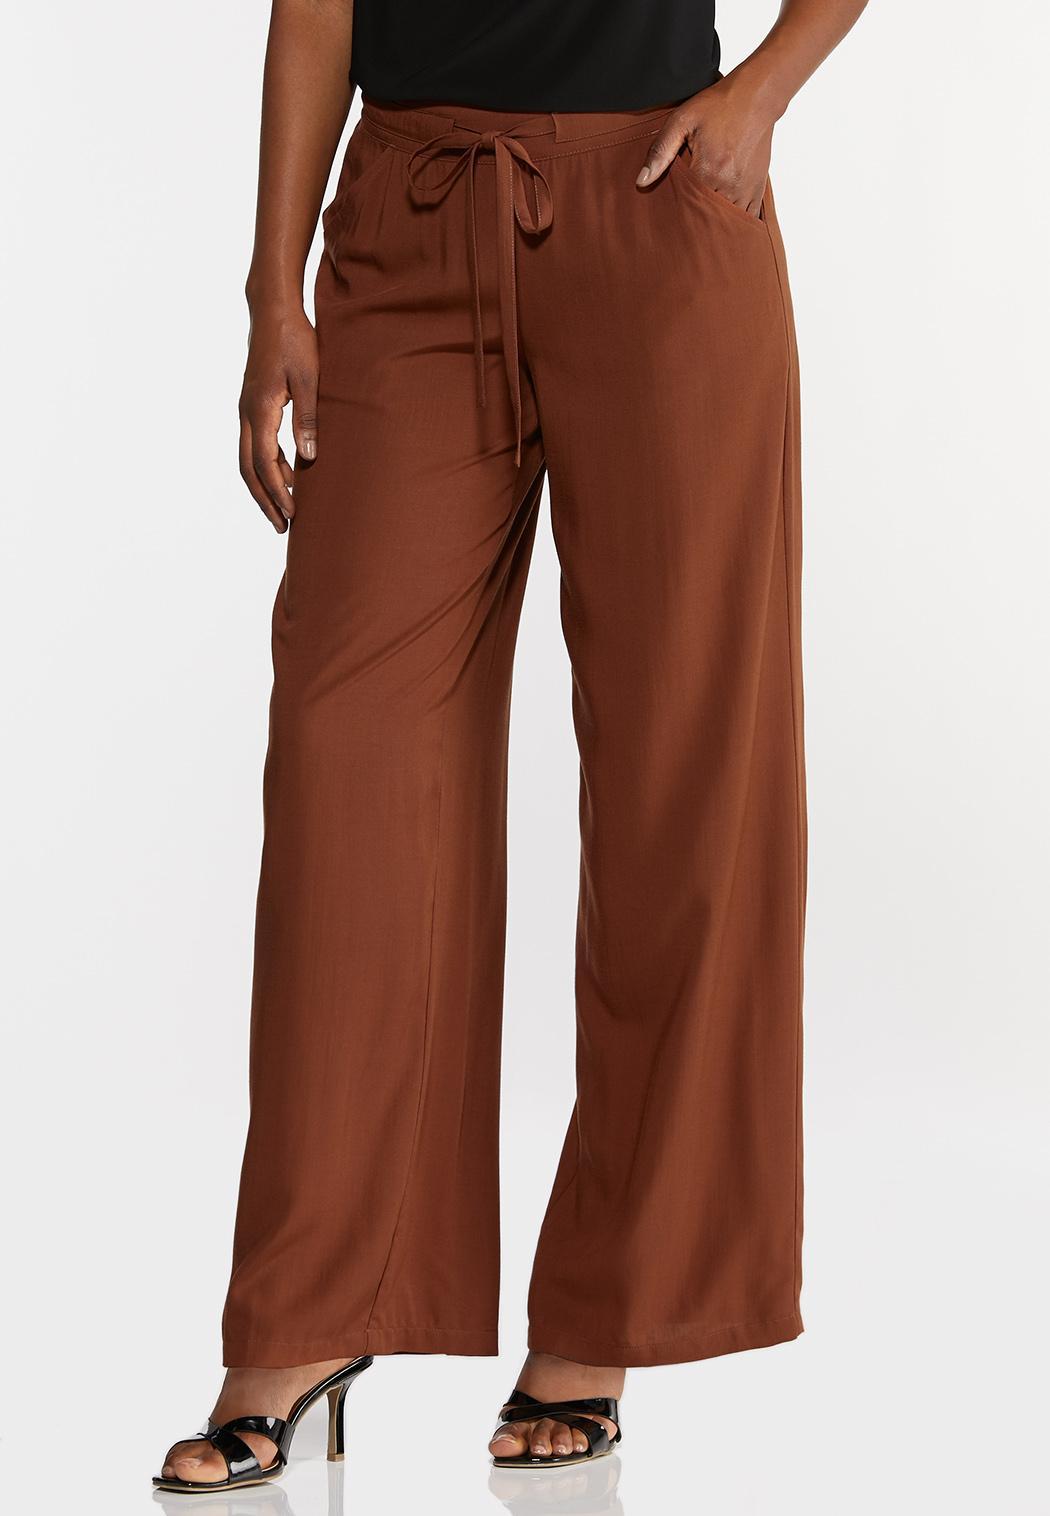 Petite Solid Wide Leg Pants (Item #44295539)